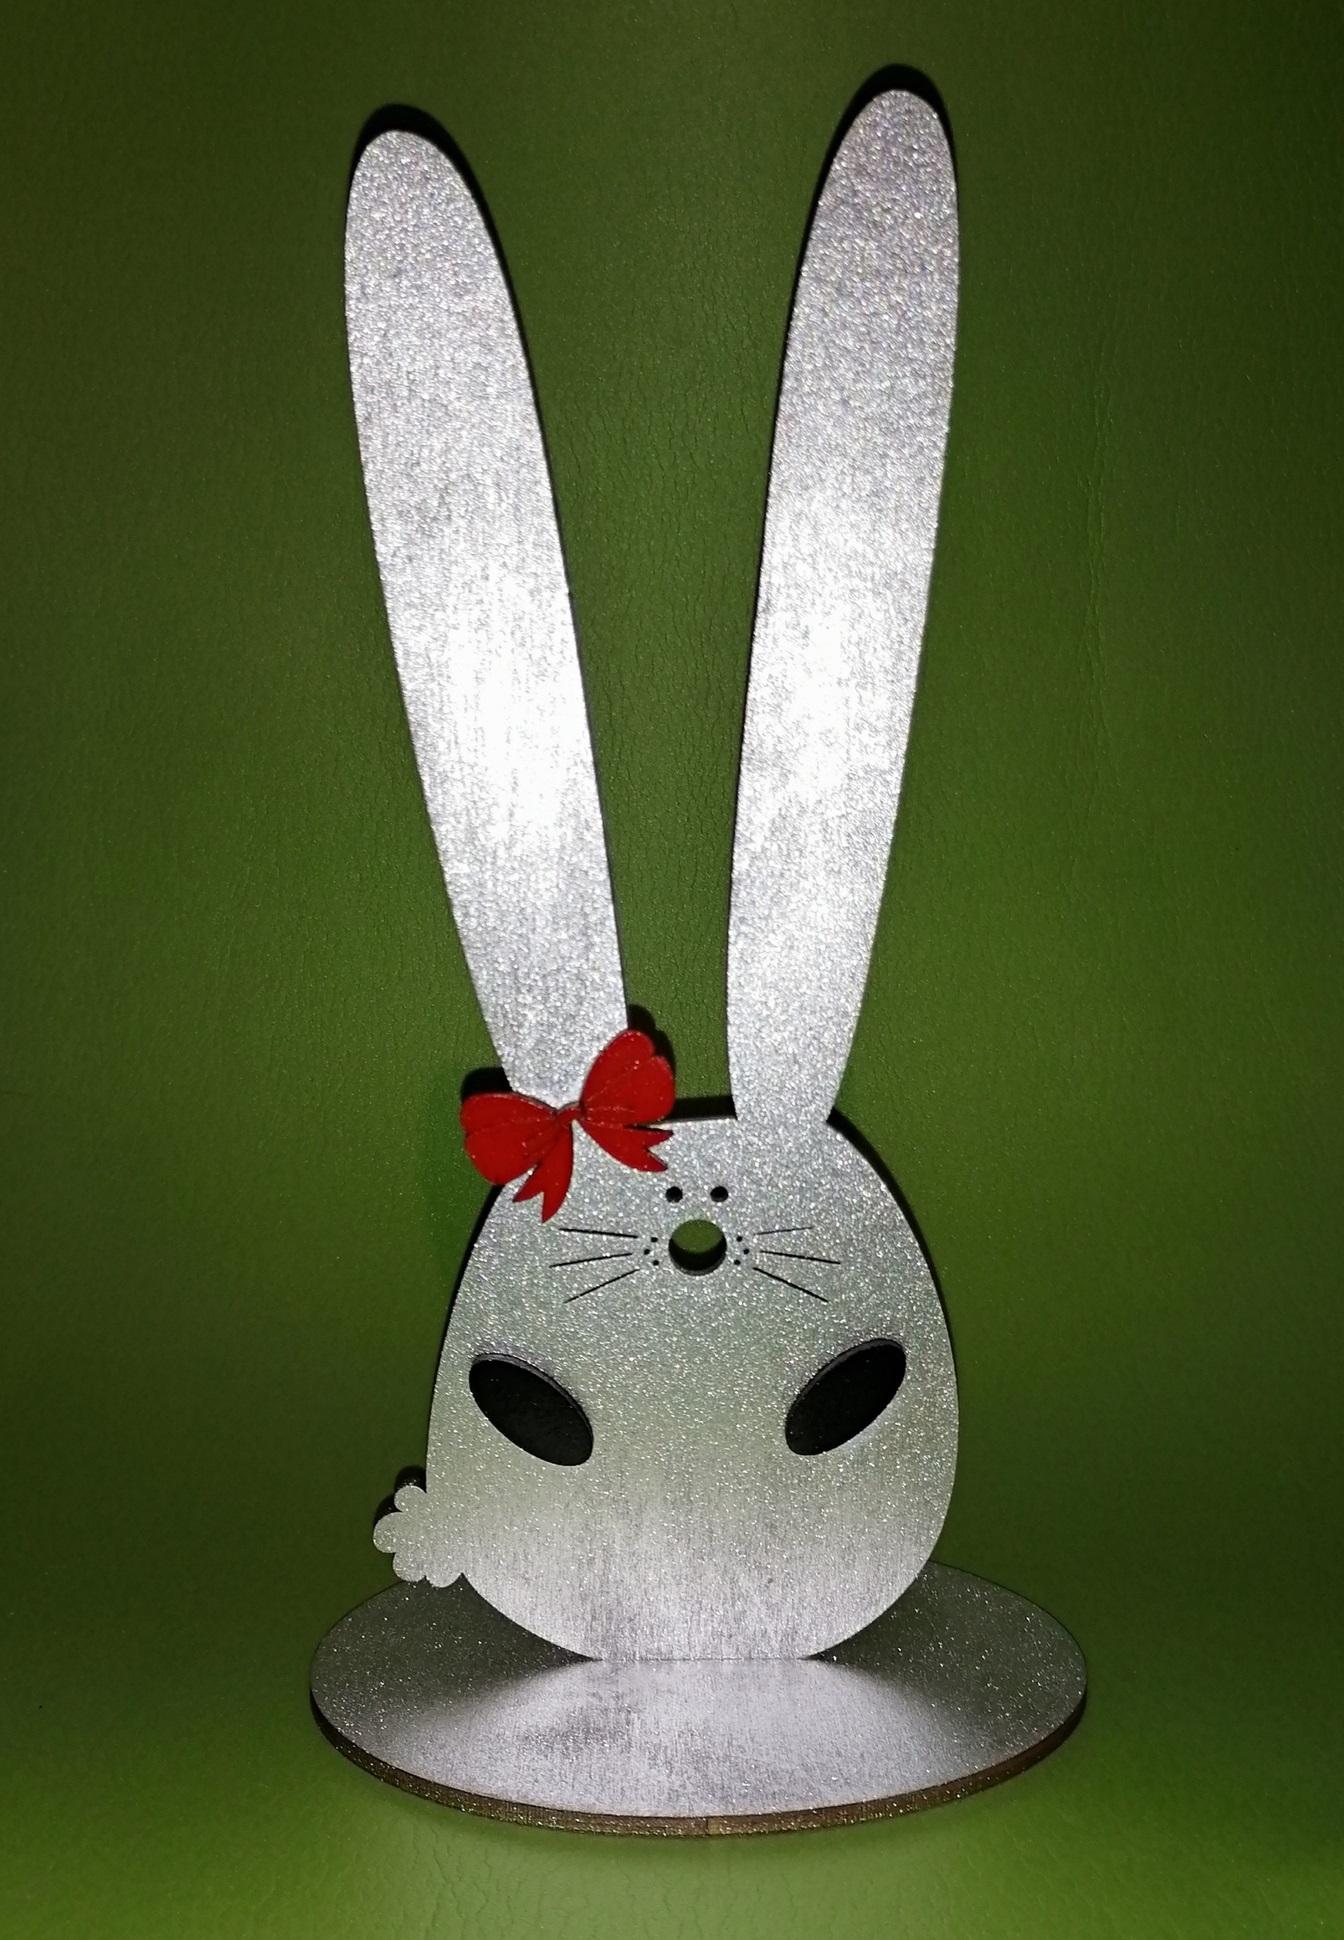 Laser Cut Bunny Hairband Stand Headband Holder Hairclip Showcase Free Vector